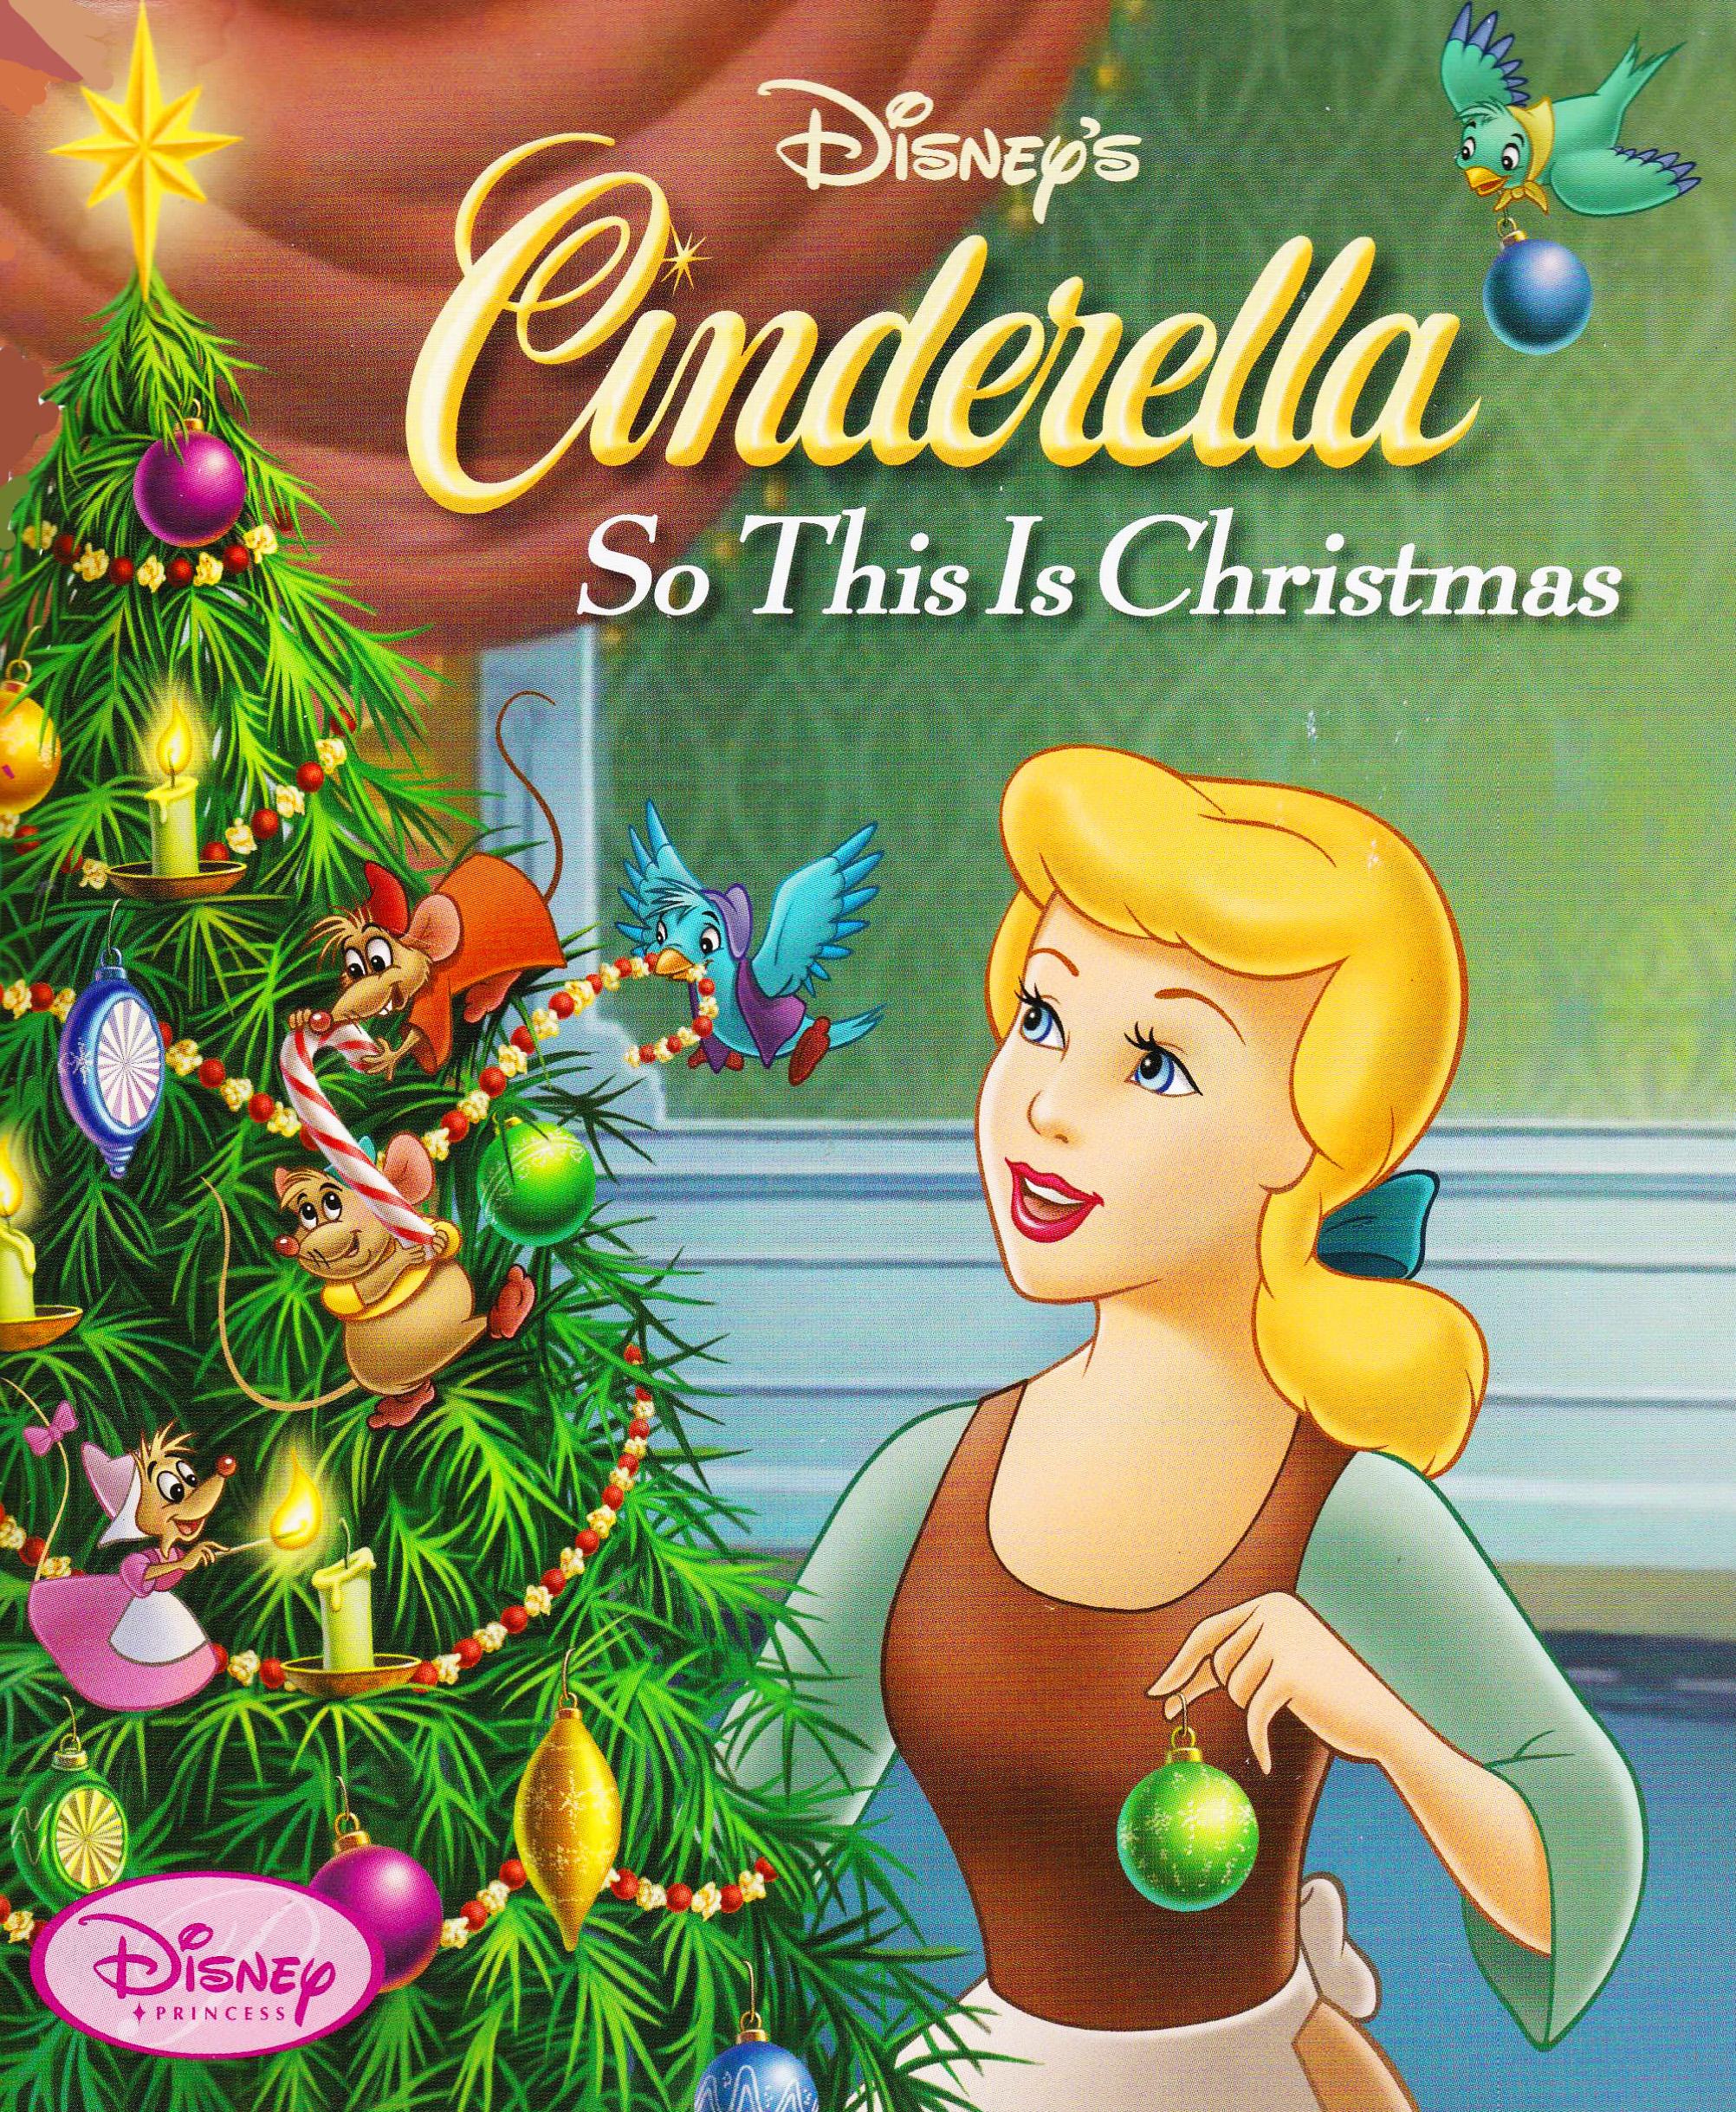 001-Cinderella-1.jpg